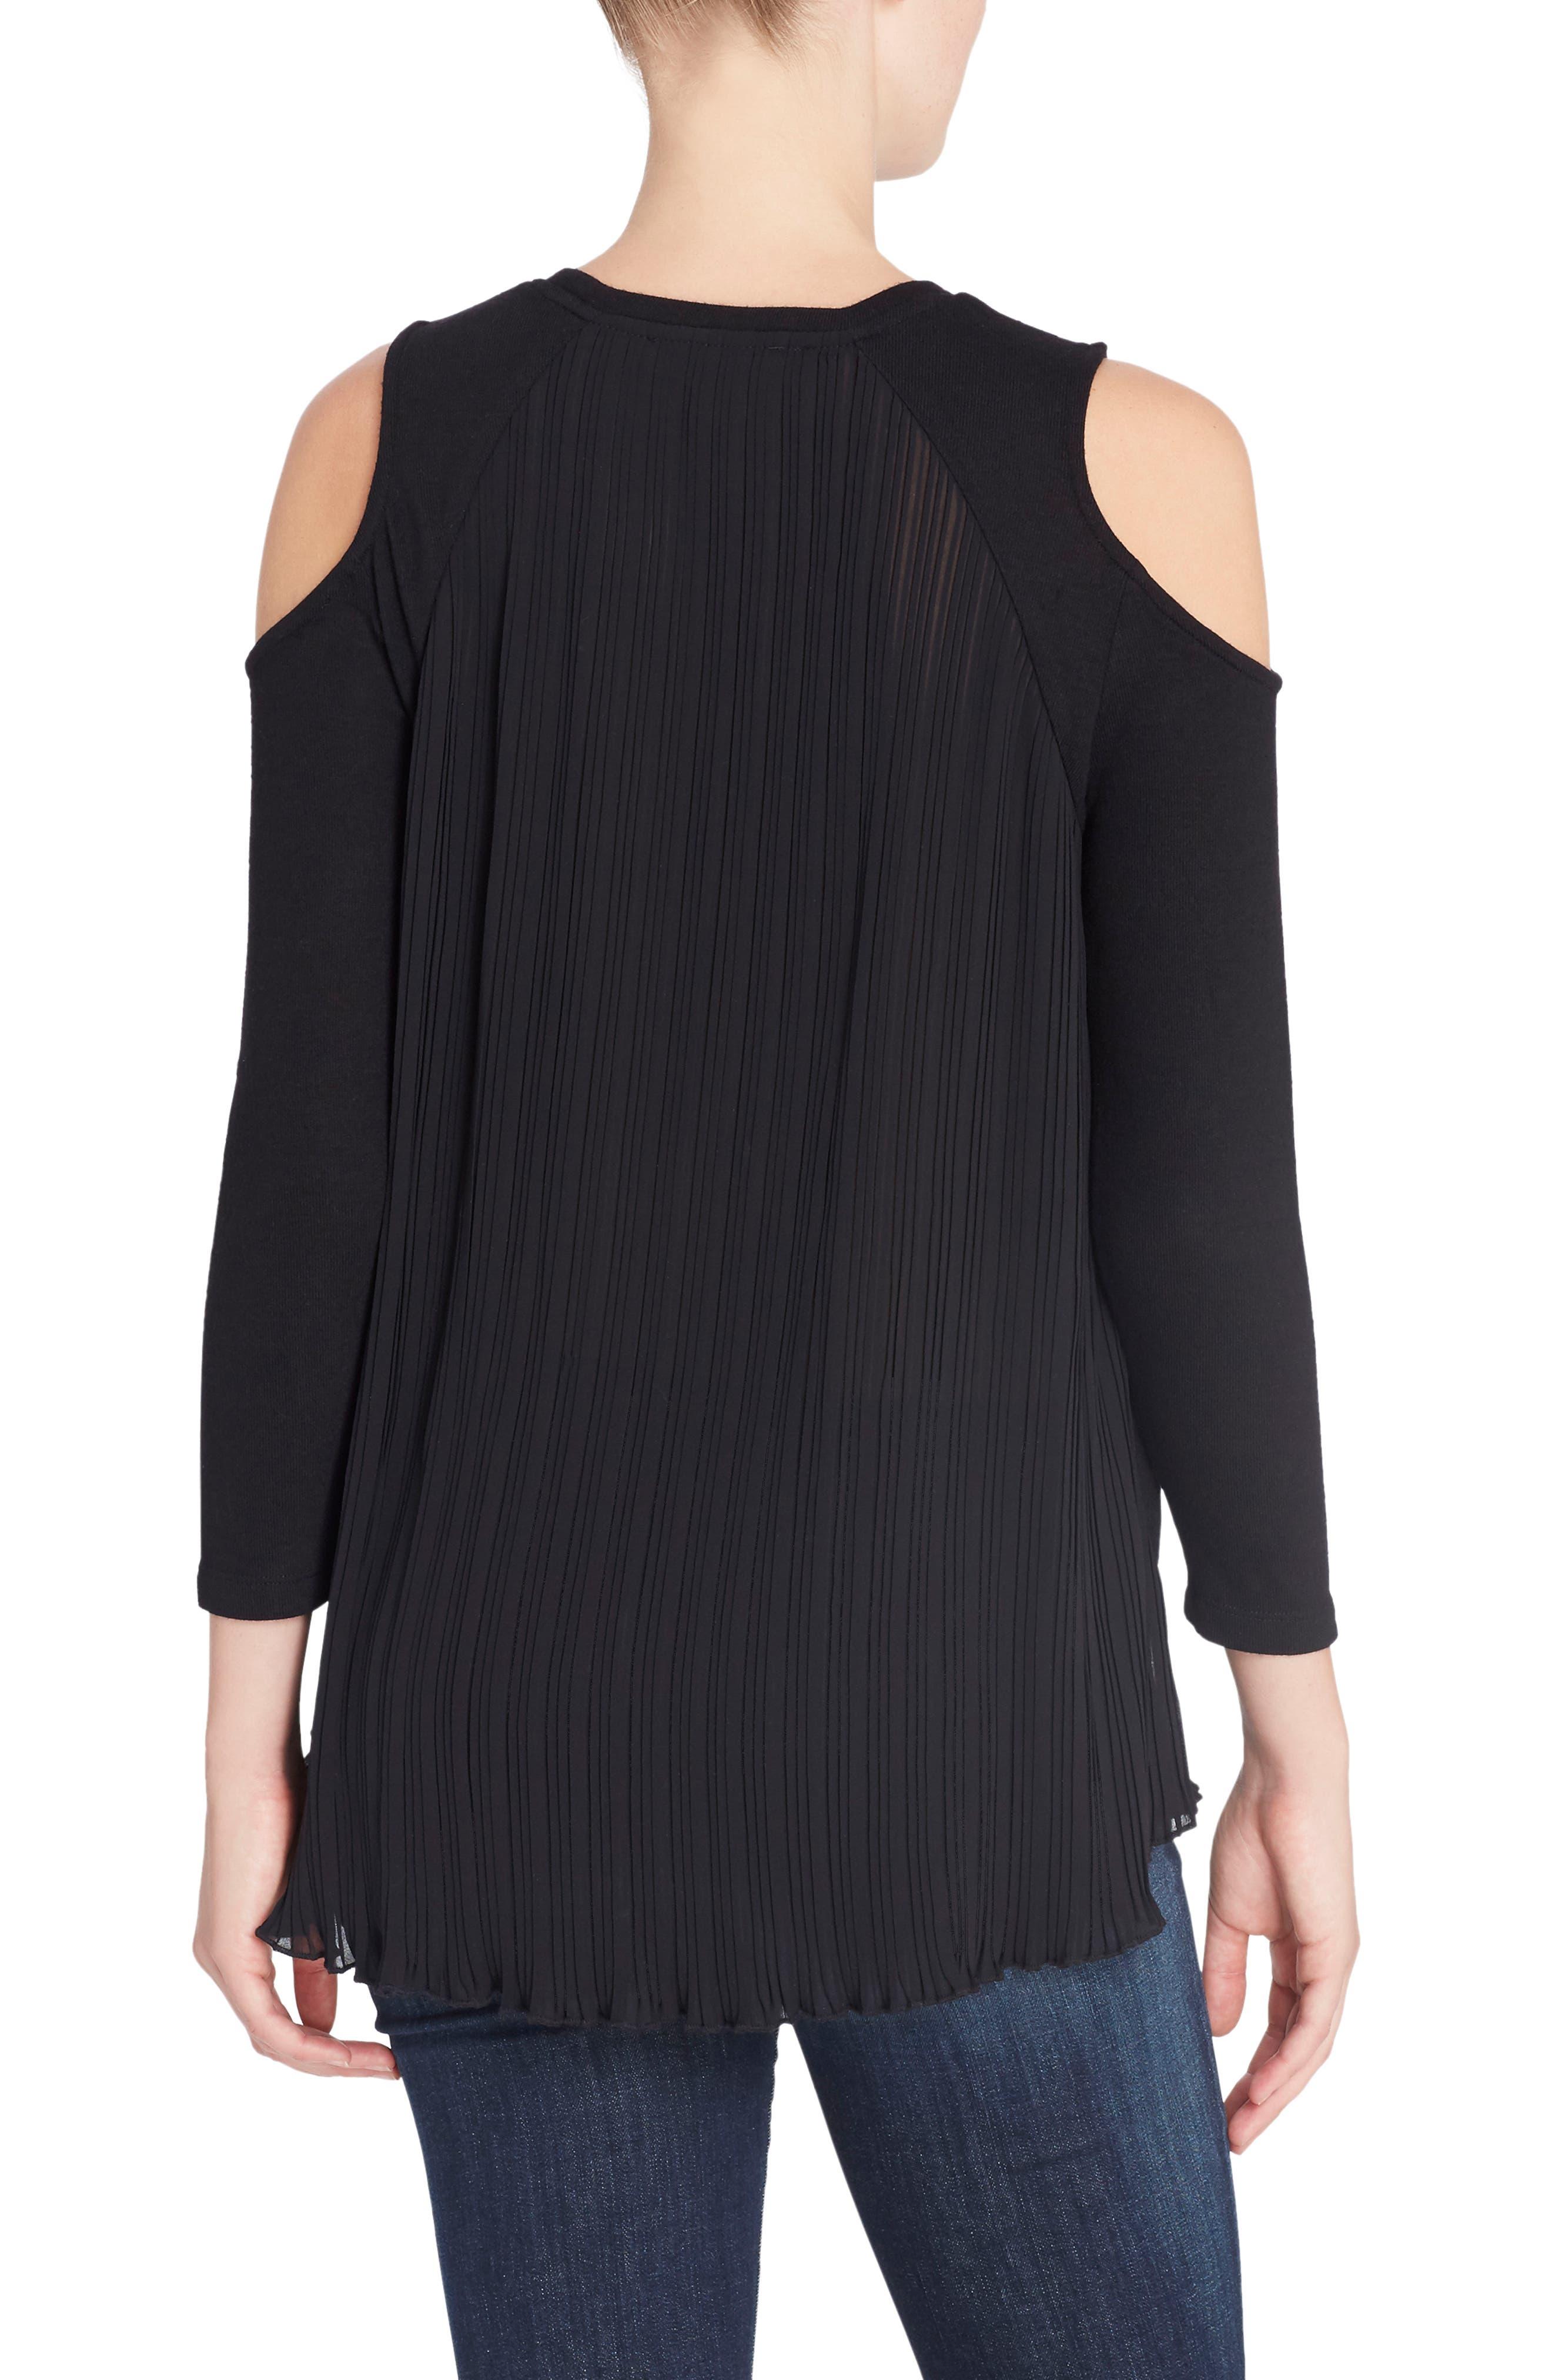 Linda Mixed Media Cold Shoulder Sweater,                             Alternate thumbnail 2, color,                             Black Beauty